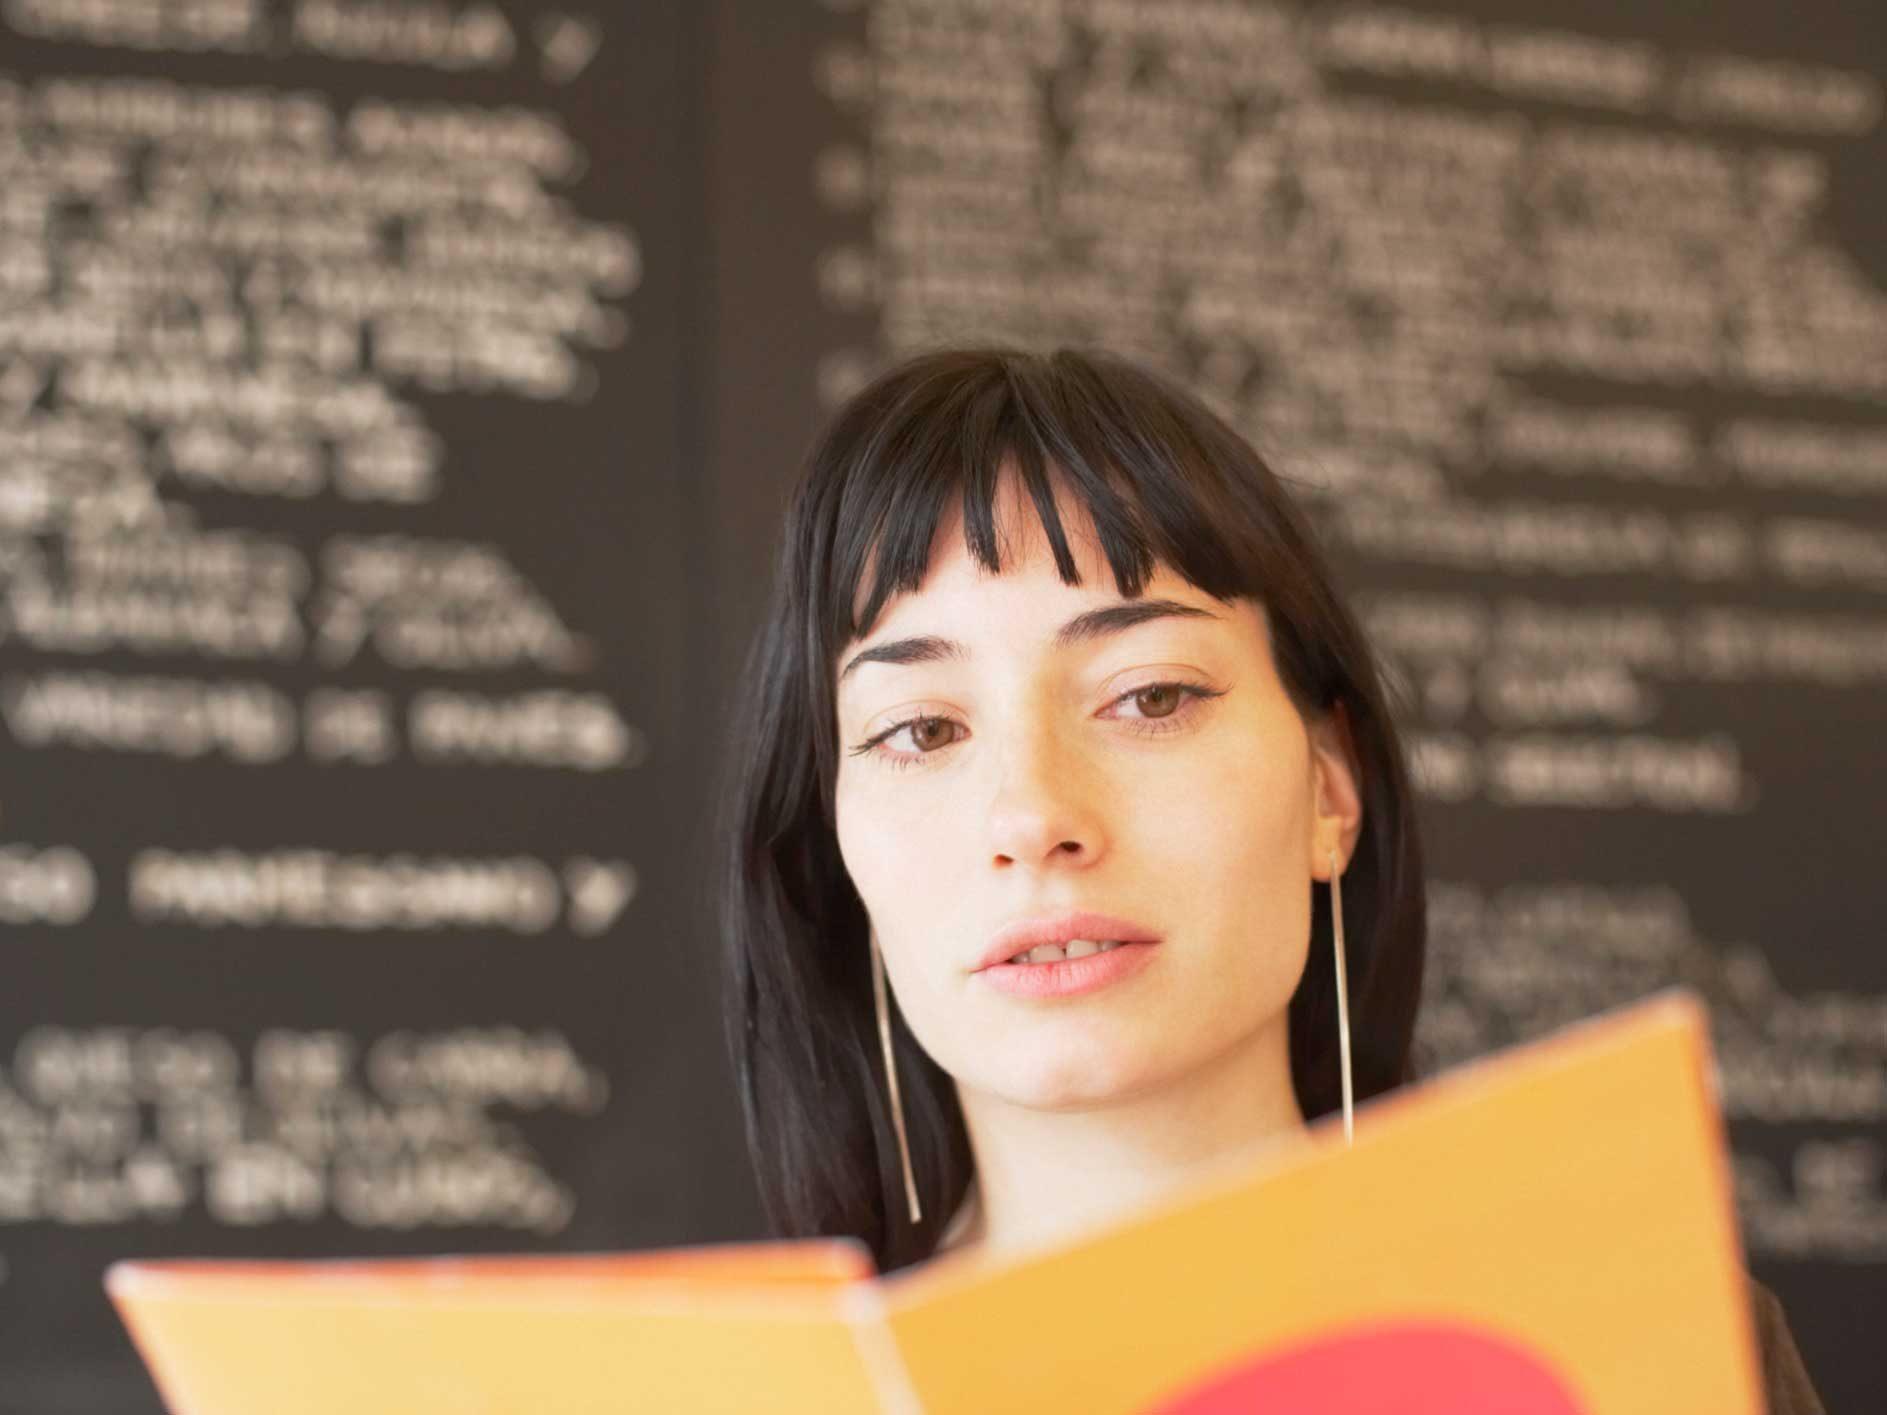 Restaurant Secrets: We Don't Wipe Down the Menus Between Customers